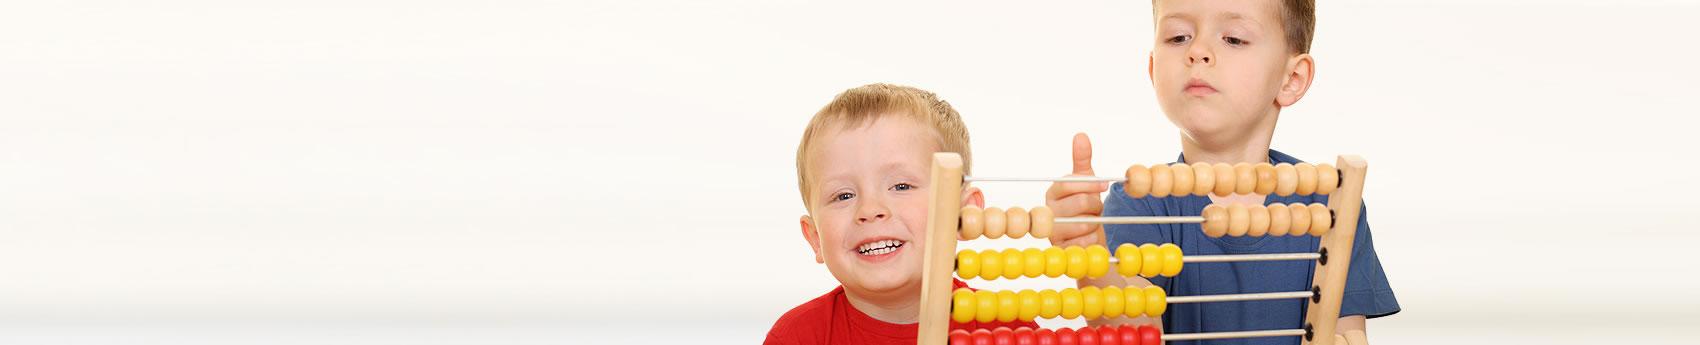 Curso de Matemática Infantil